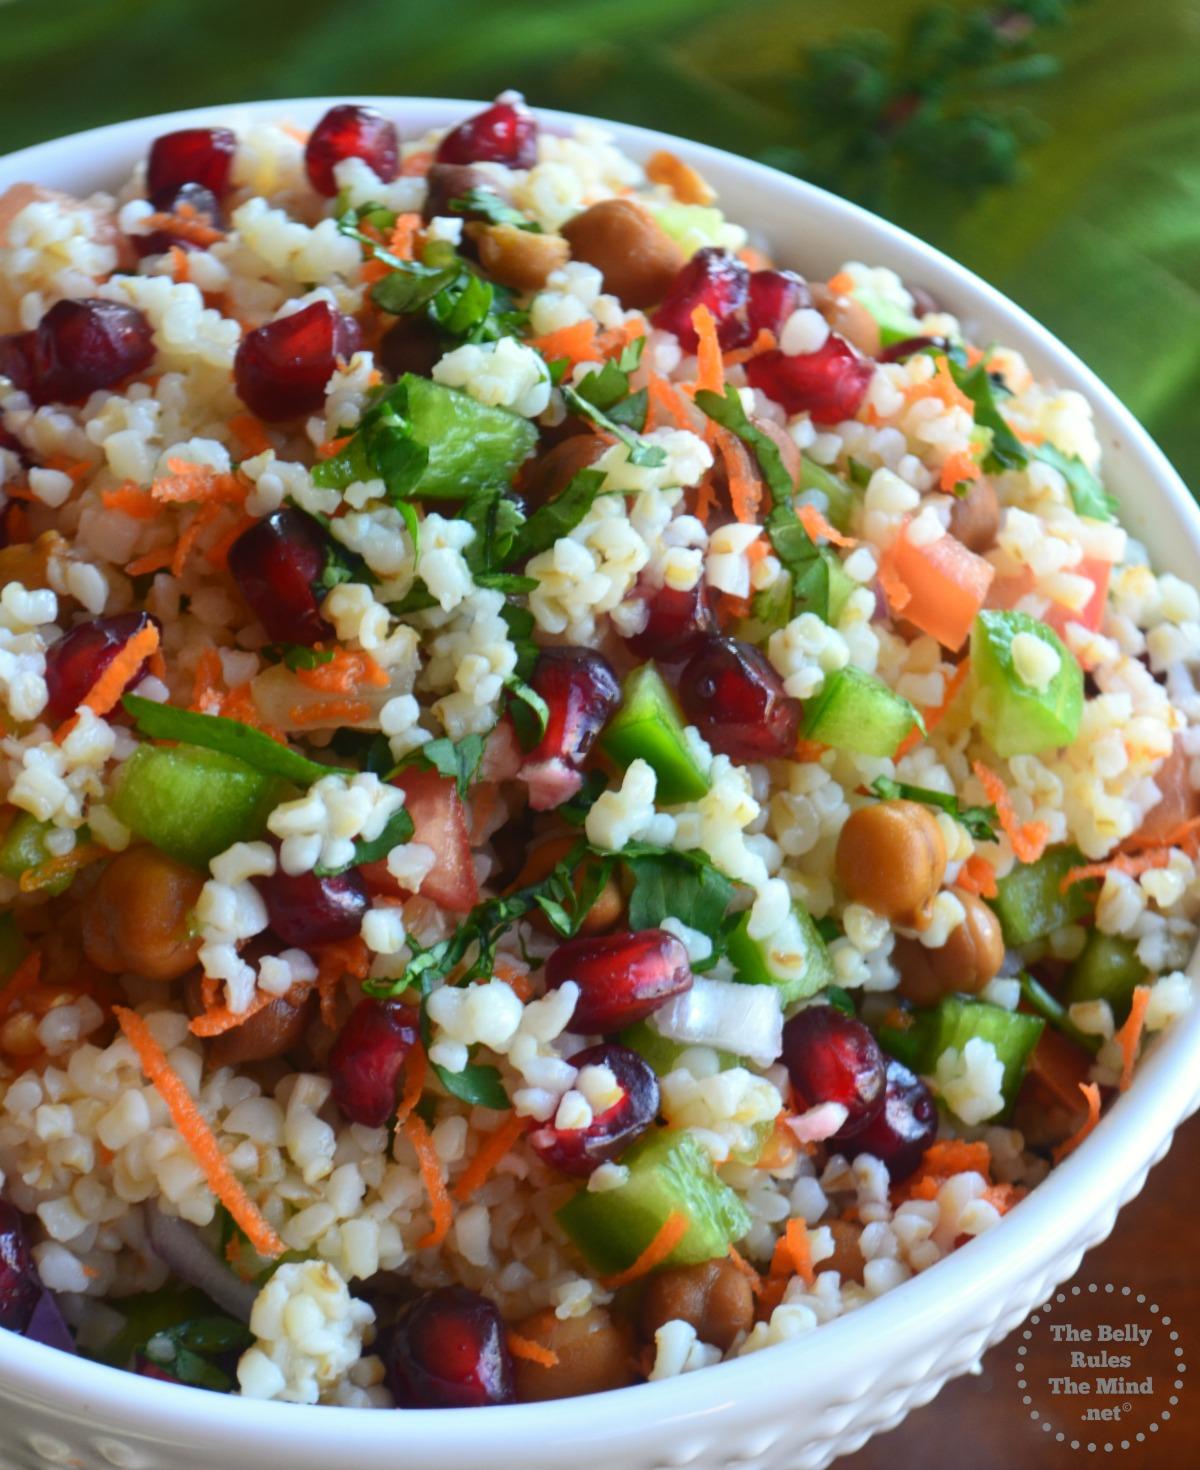 Bulgar wheat salad (Daliya salad)